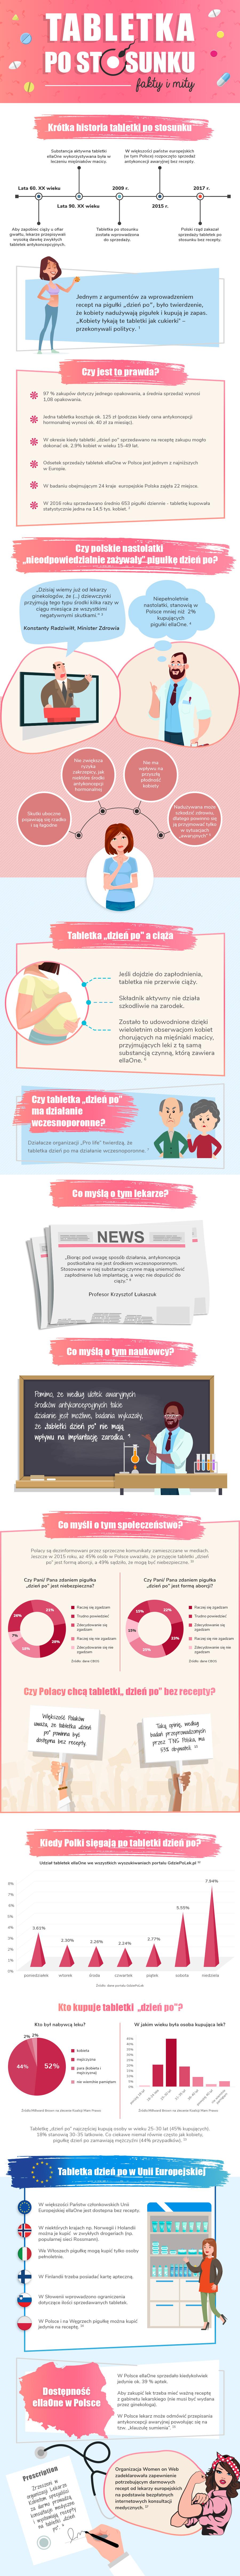 Fakty i mity o tabletce po stosunku